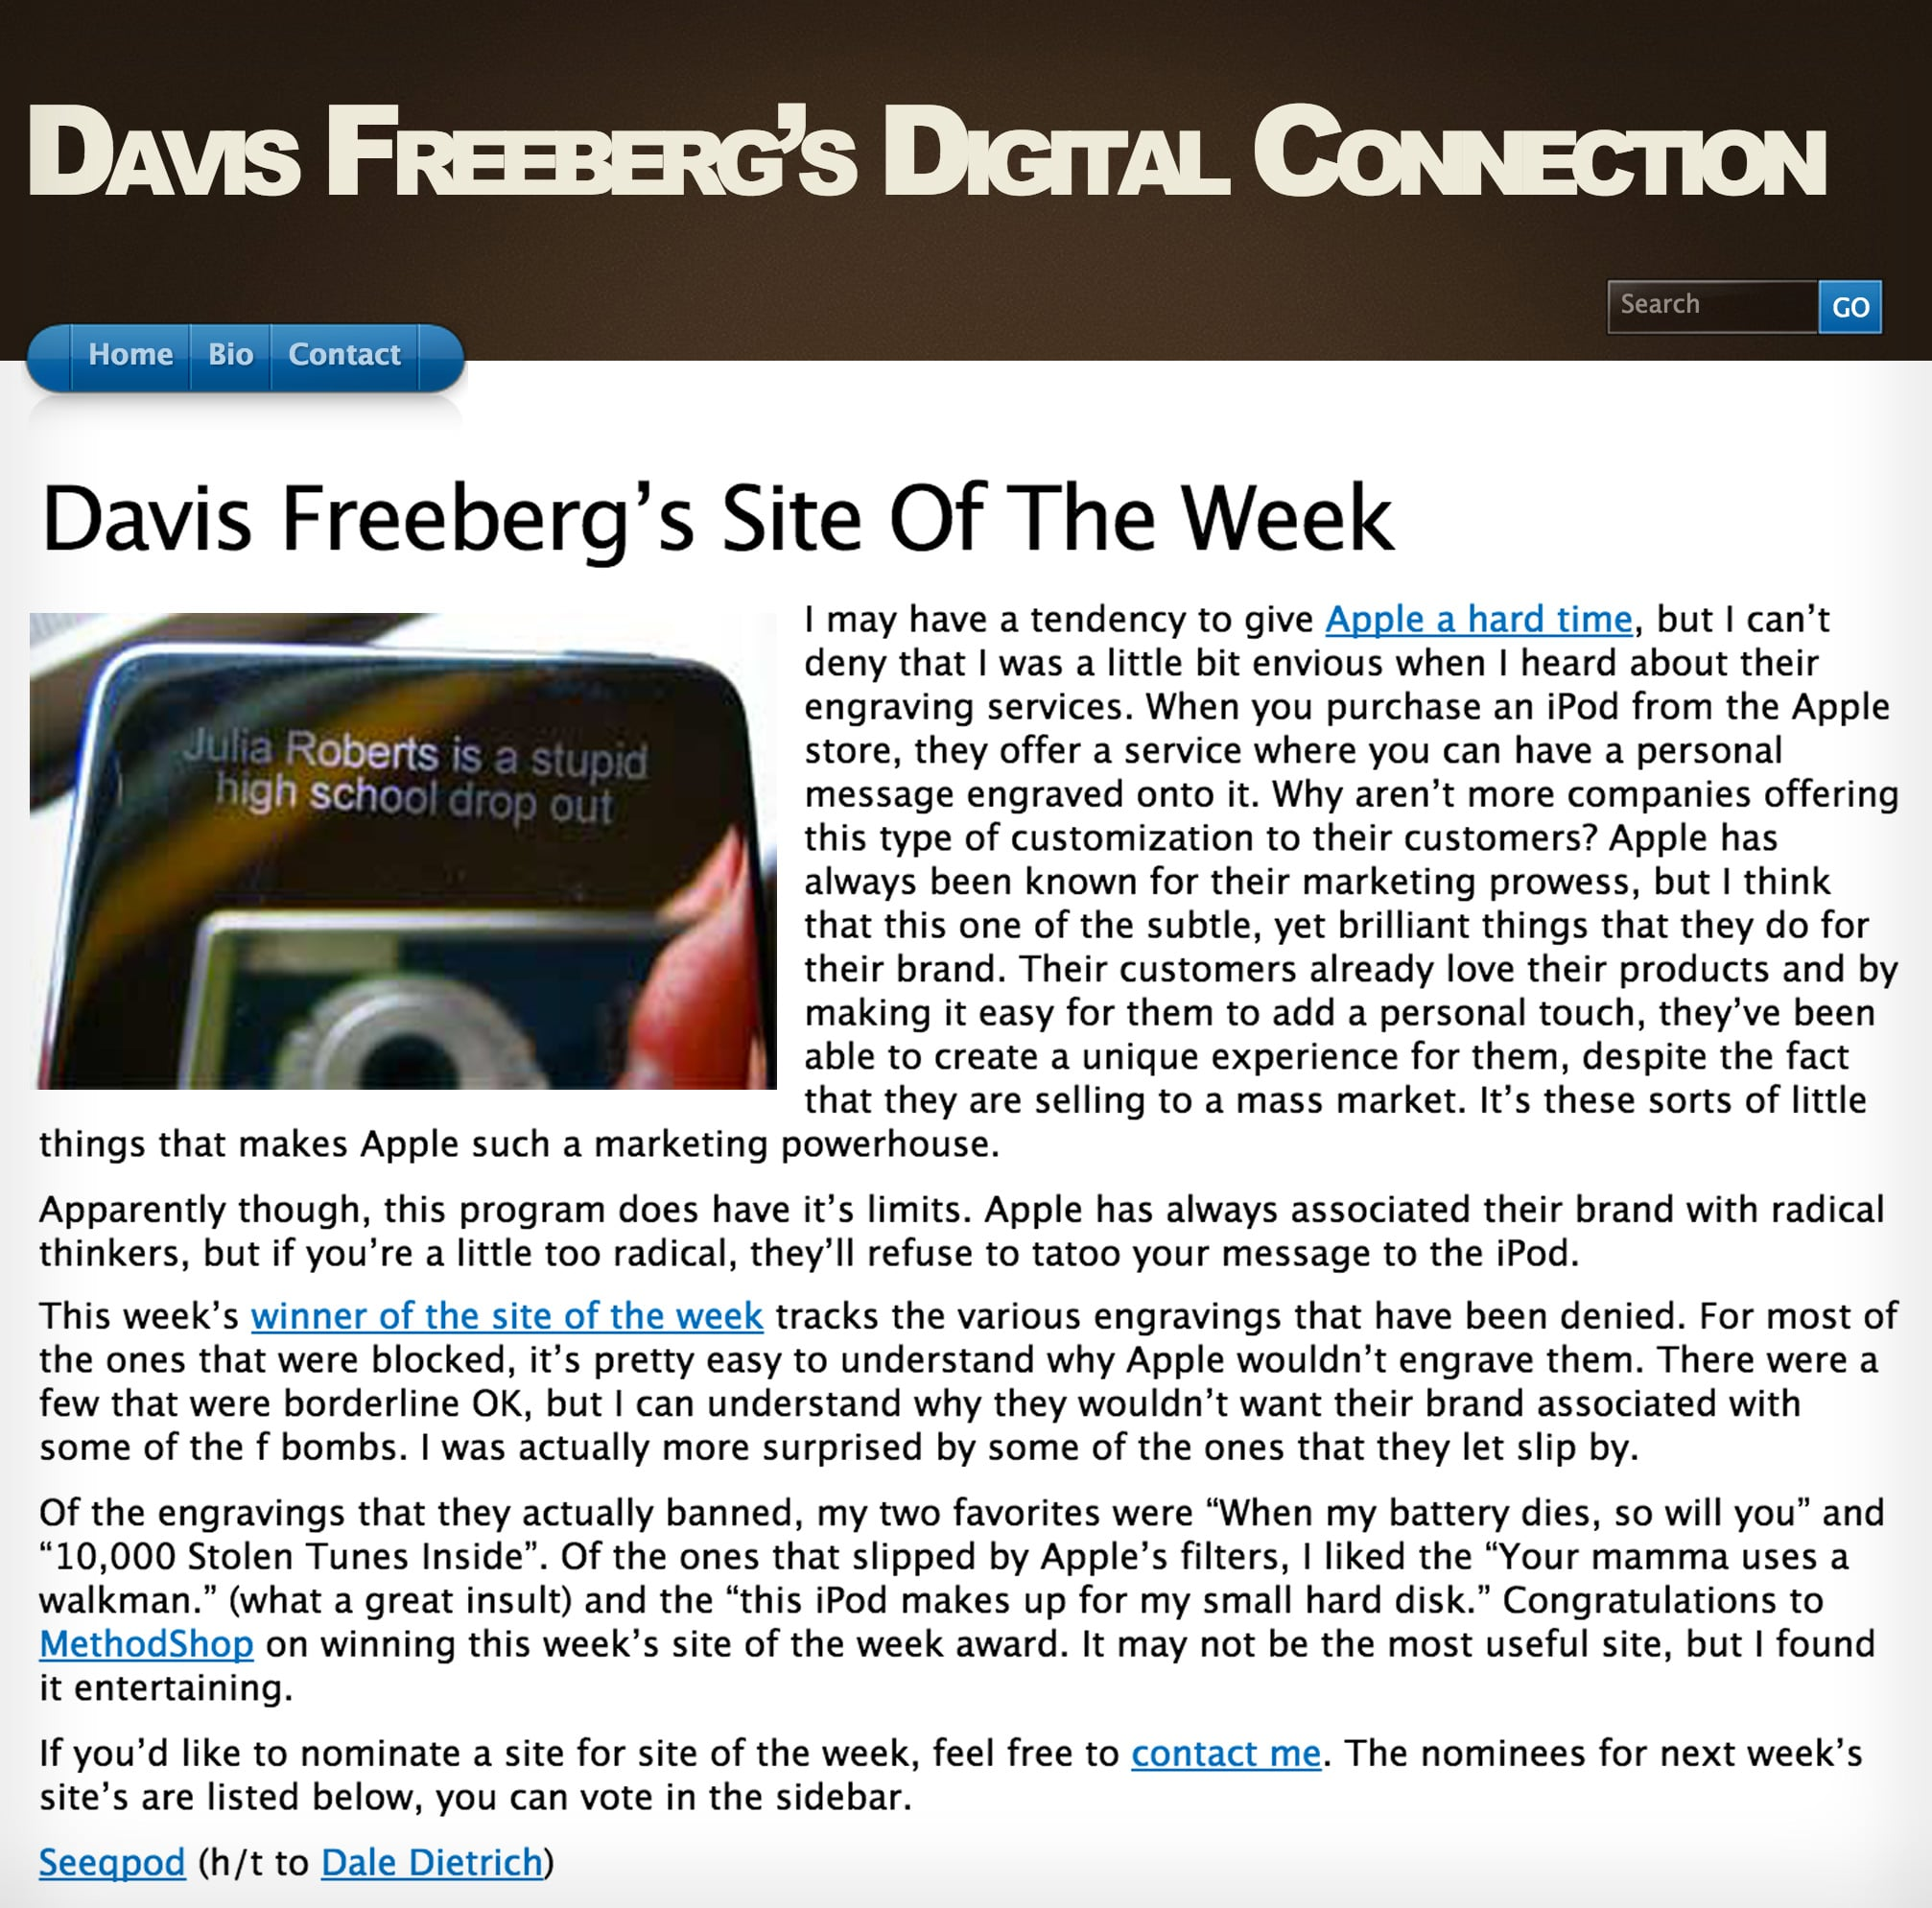 Davis Freeberg's Site Of The Week: MethodShop